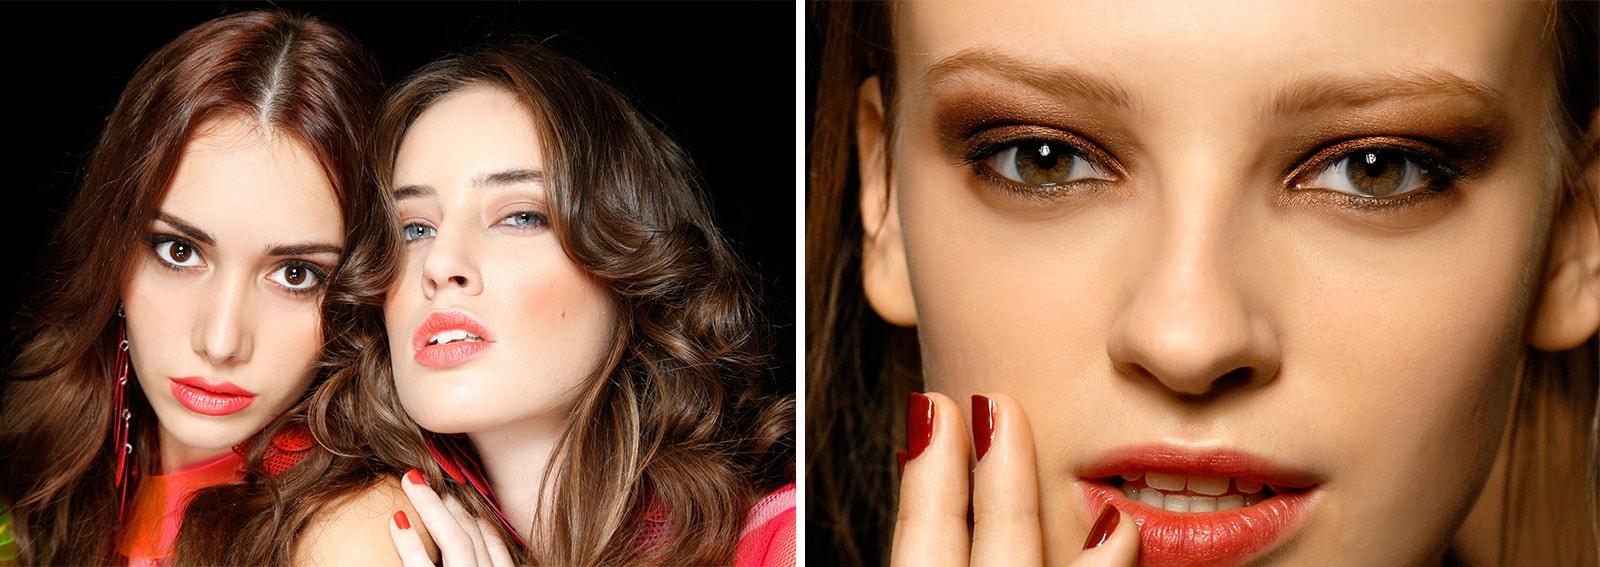 make-up-economico-desktop